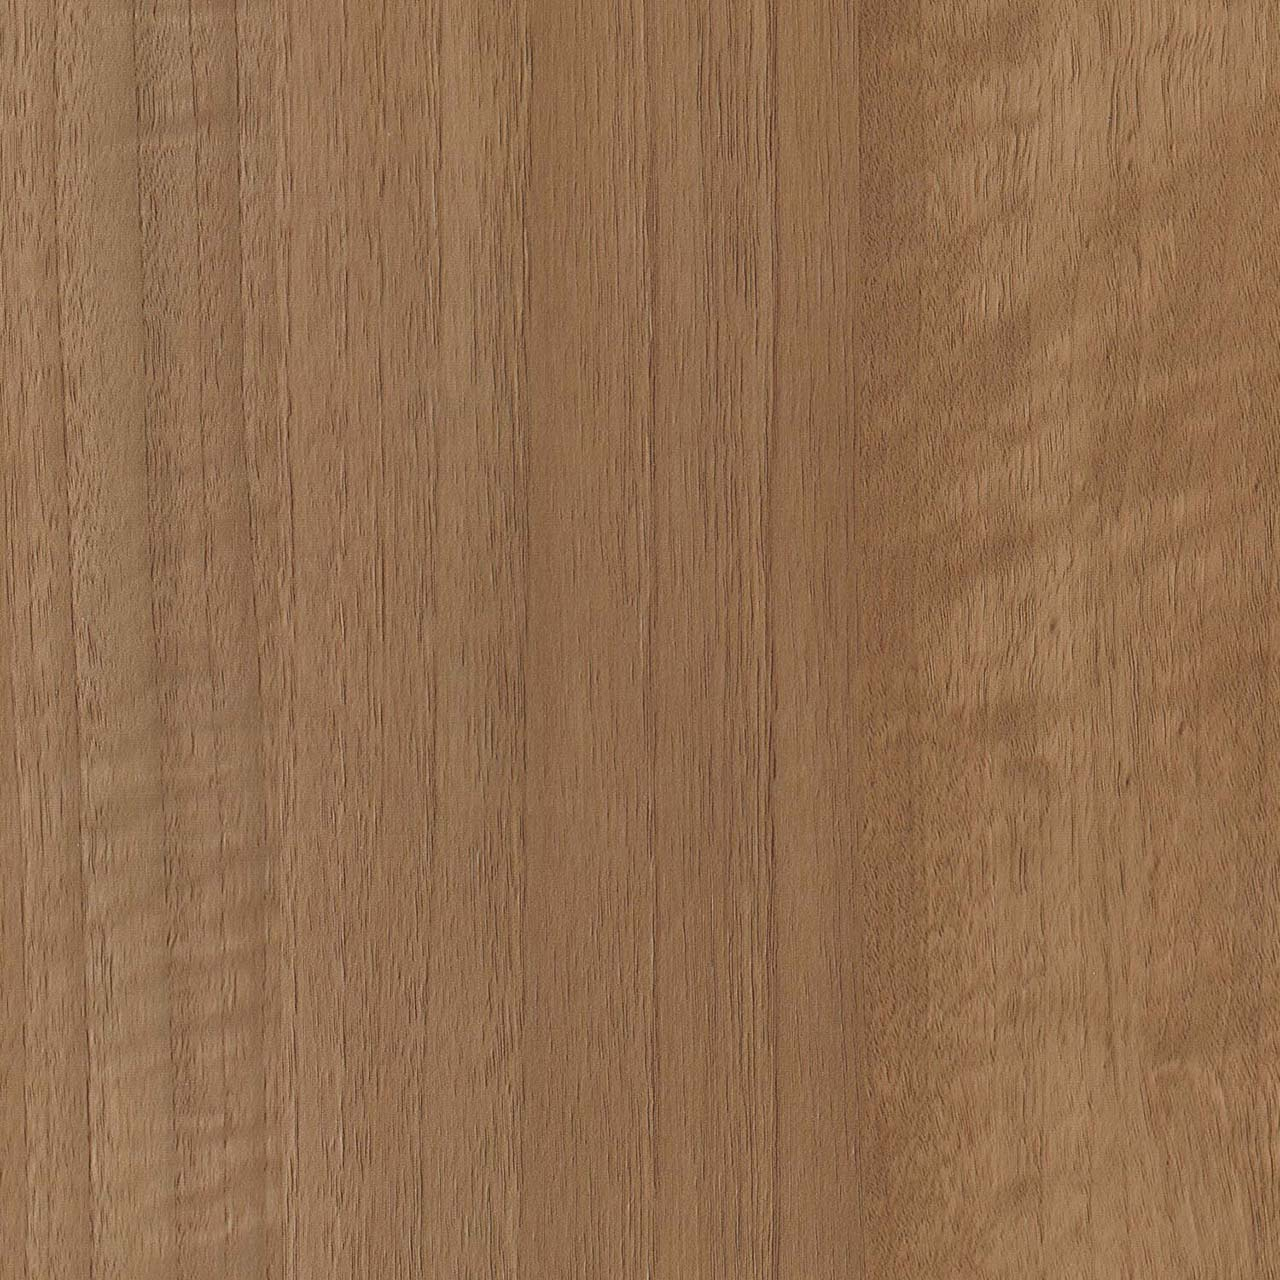 French Walnut effect laminate panel